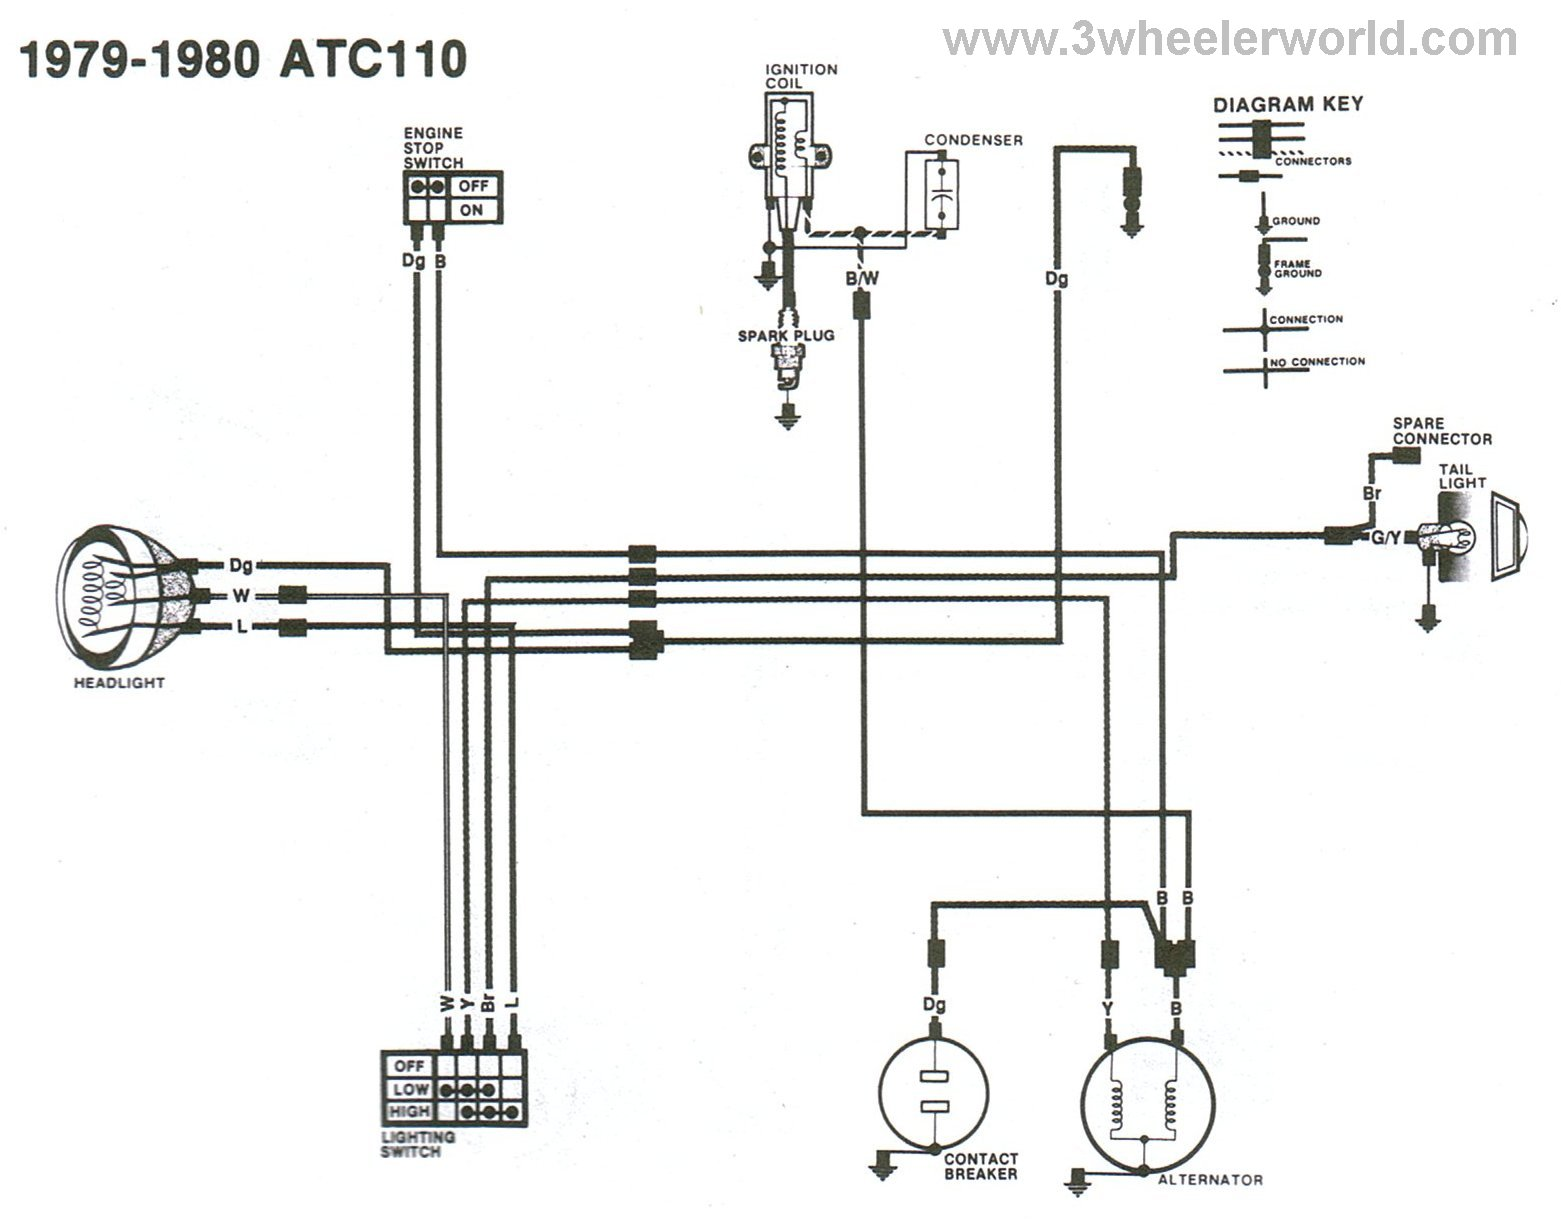 honda 3 wheeler wiring harness honda 3 wheeler wiring diagram